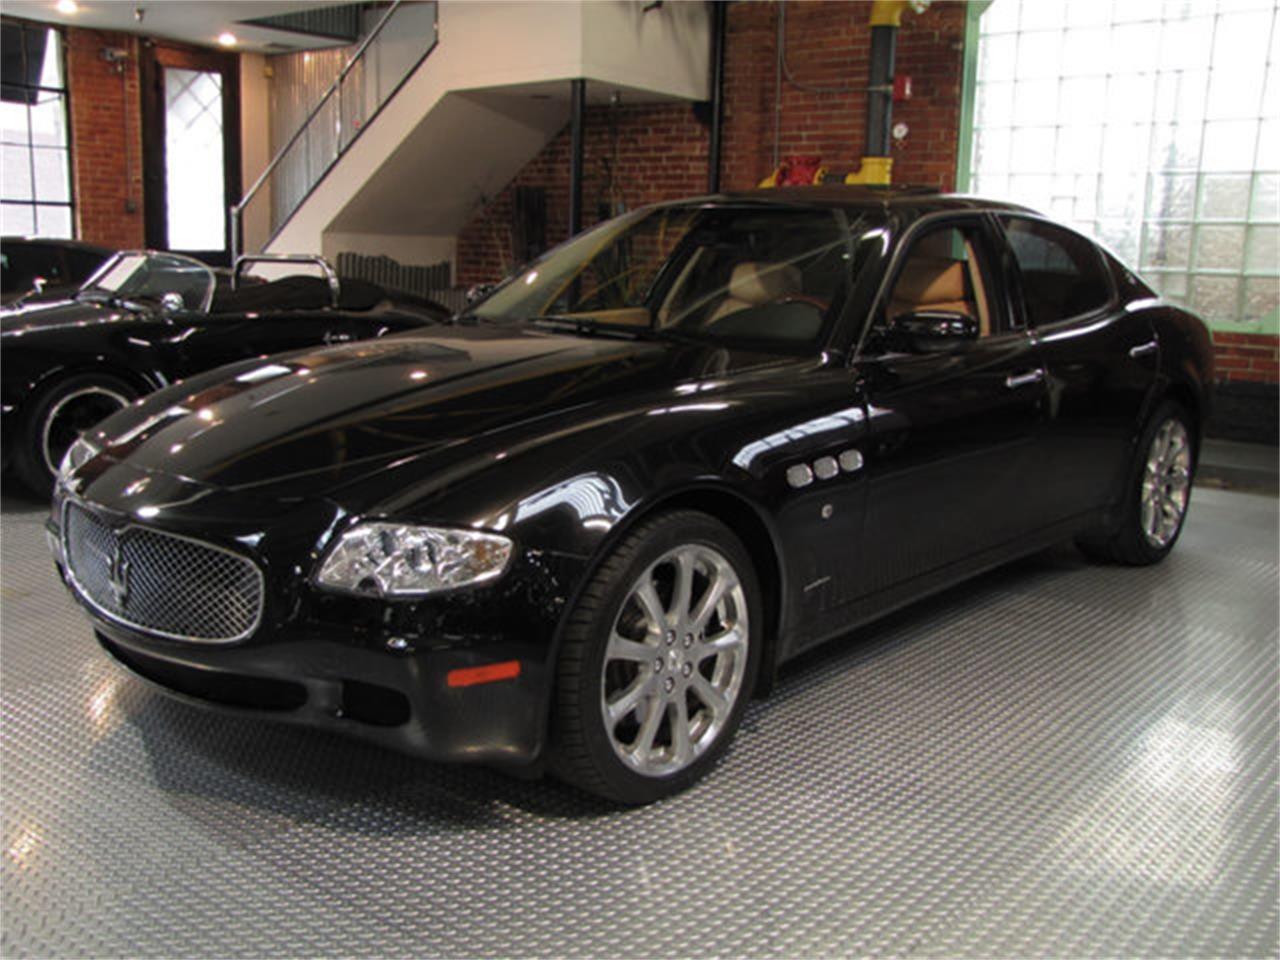 2007 Maserati Quattroporte For Sale Classiccars Com Cc 1065746